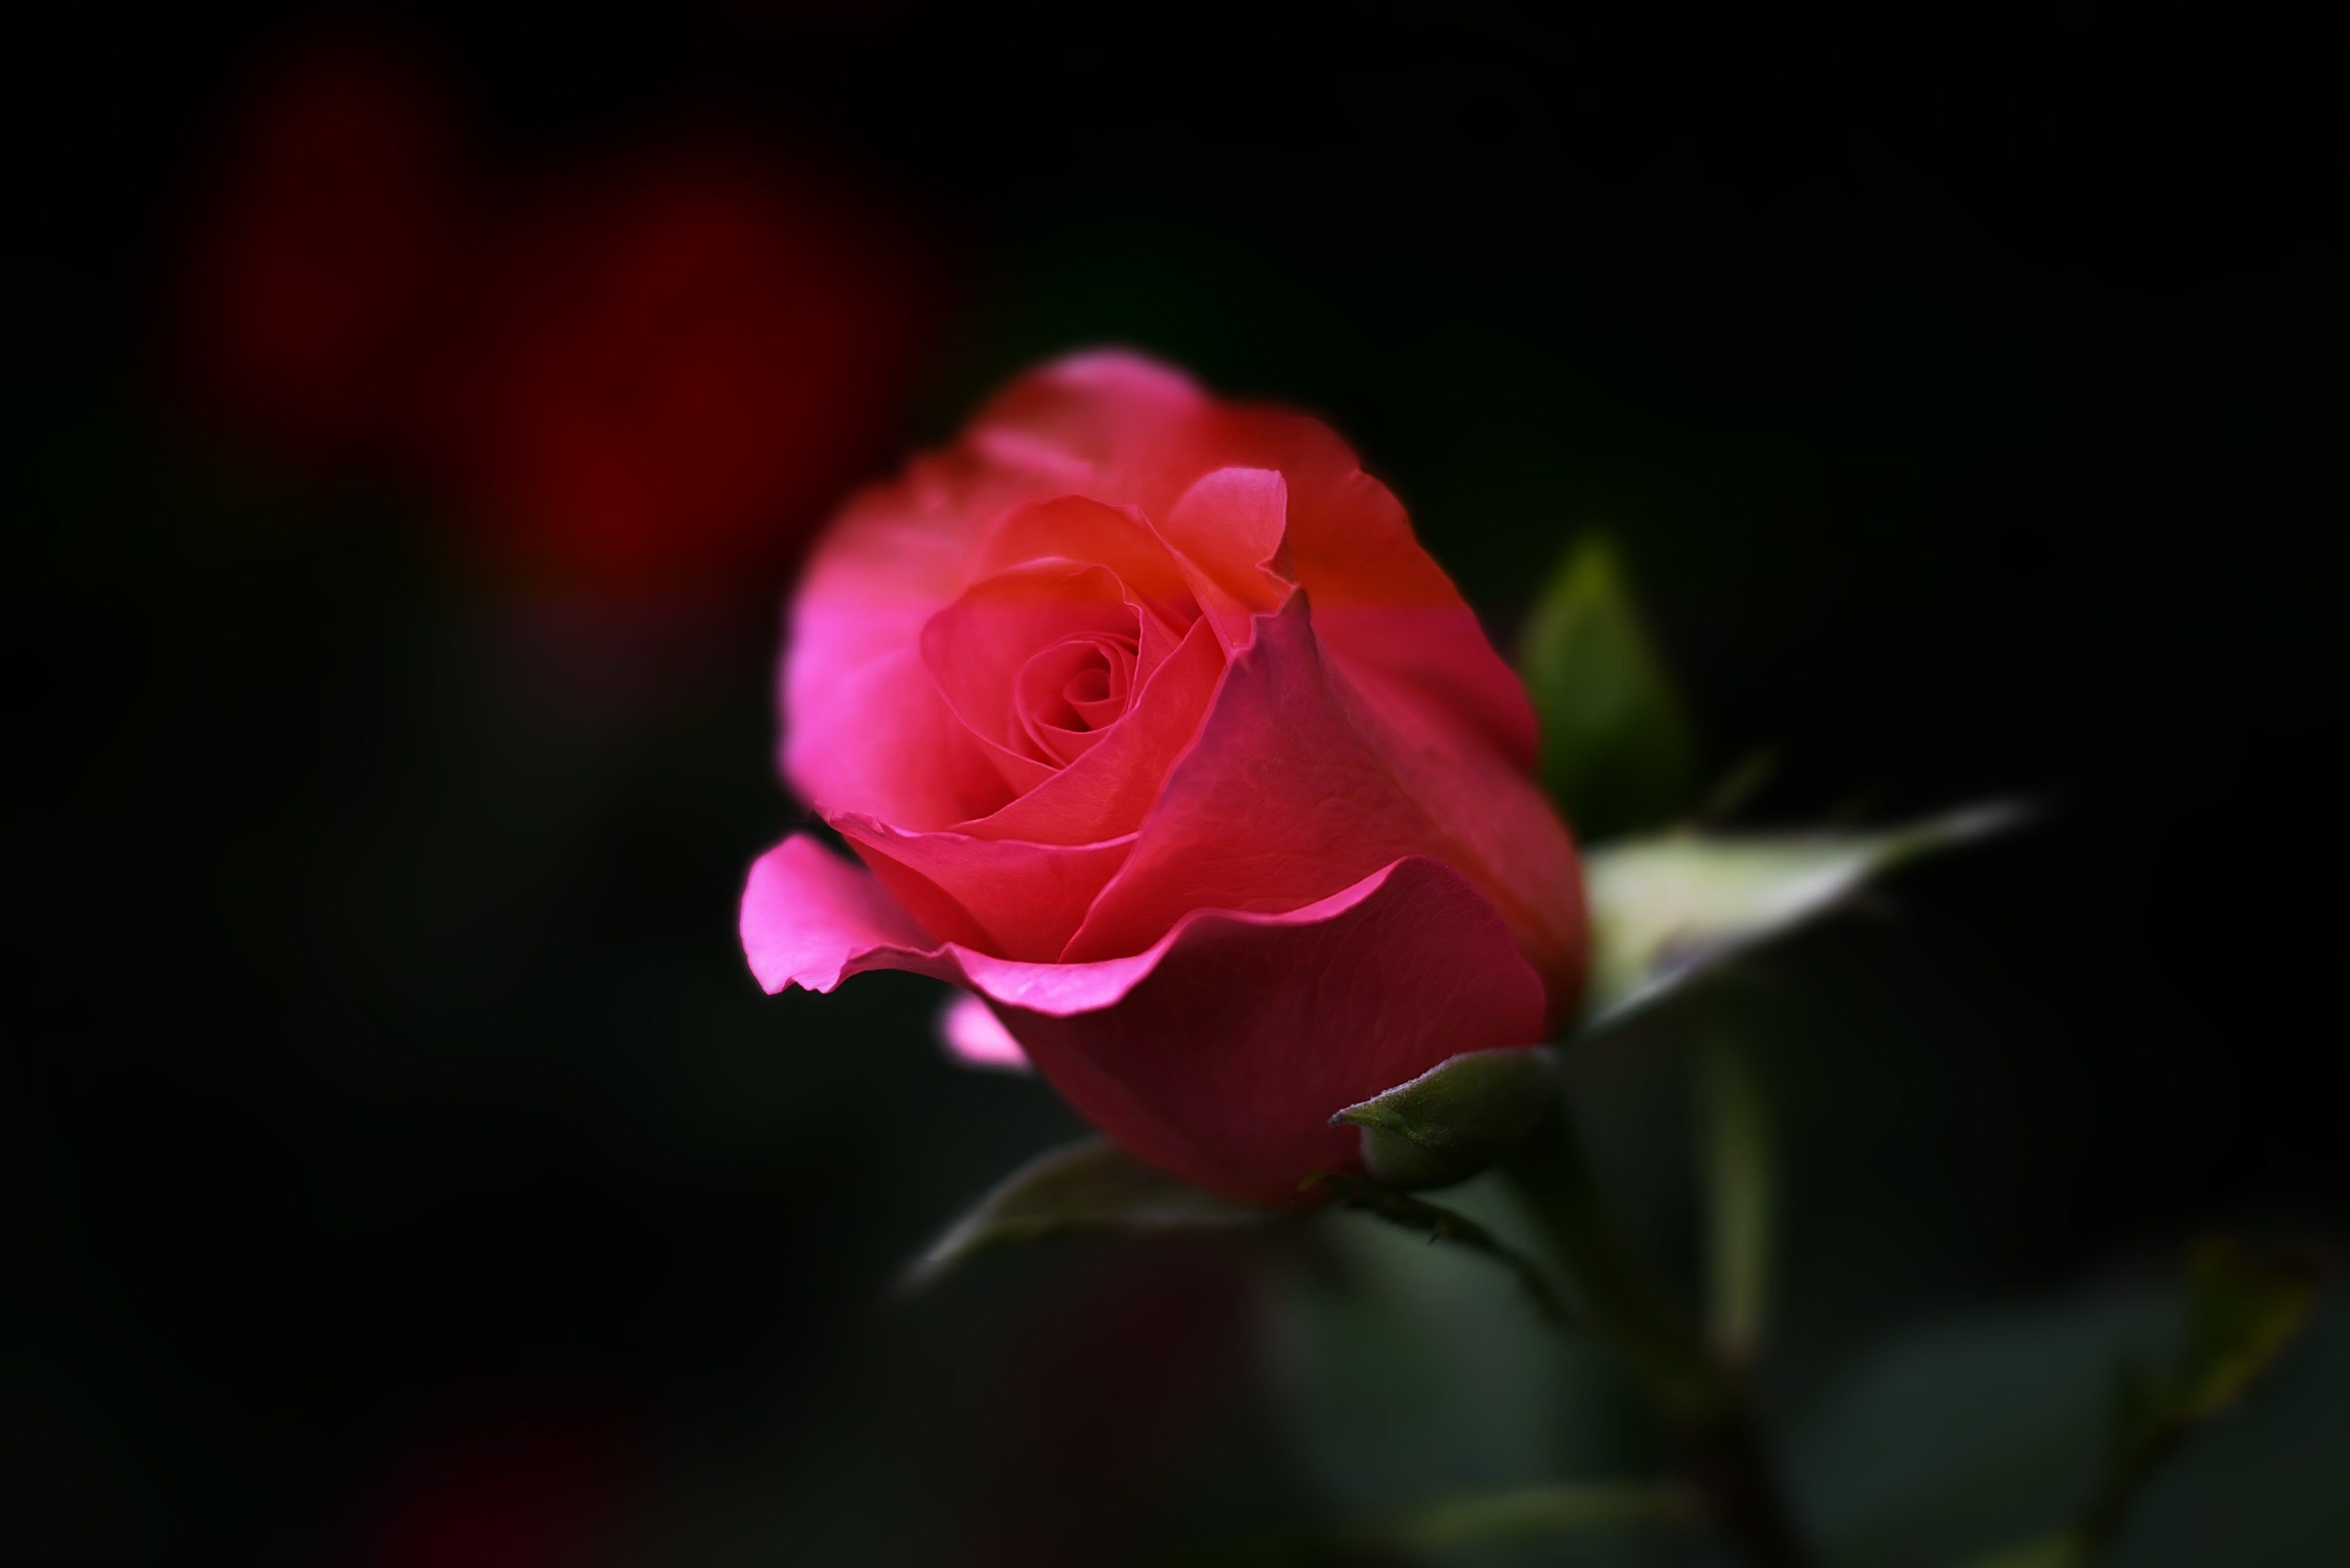 beauty, black background, bloom